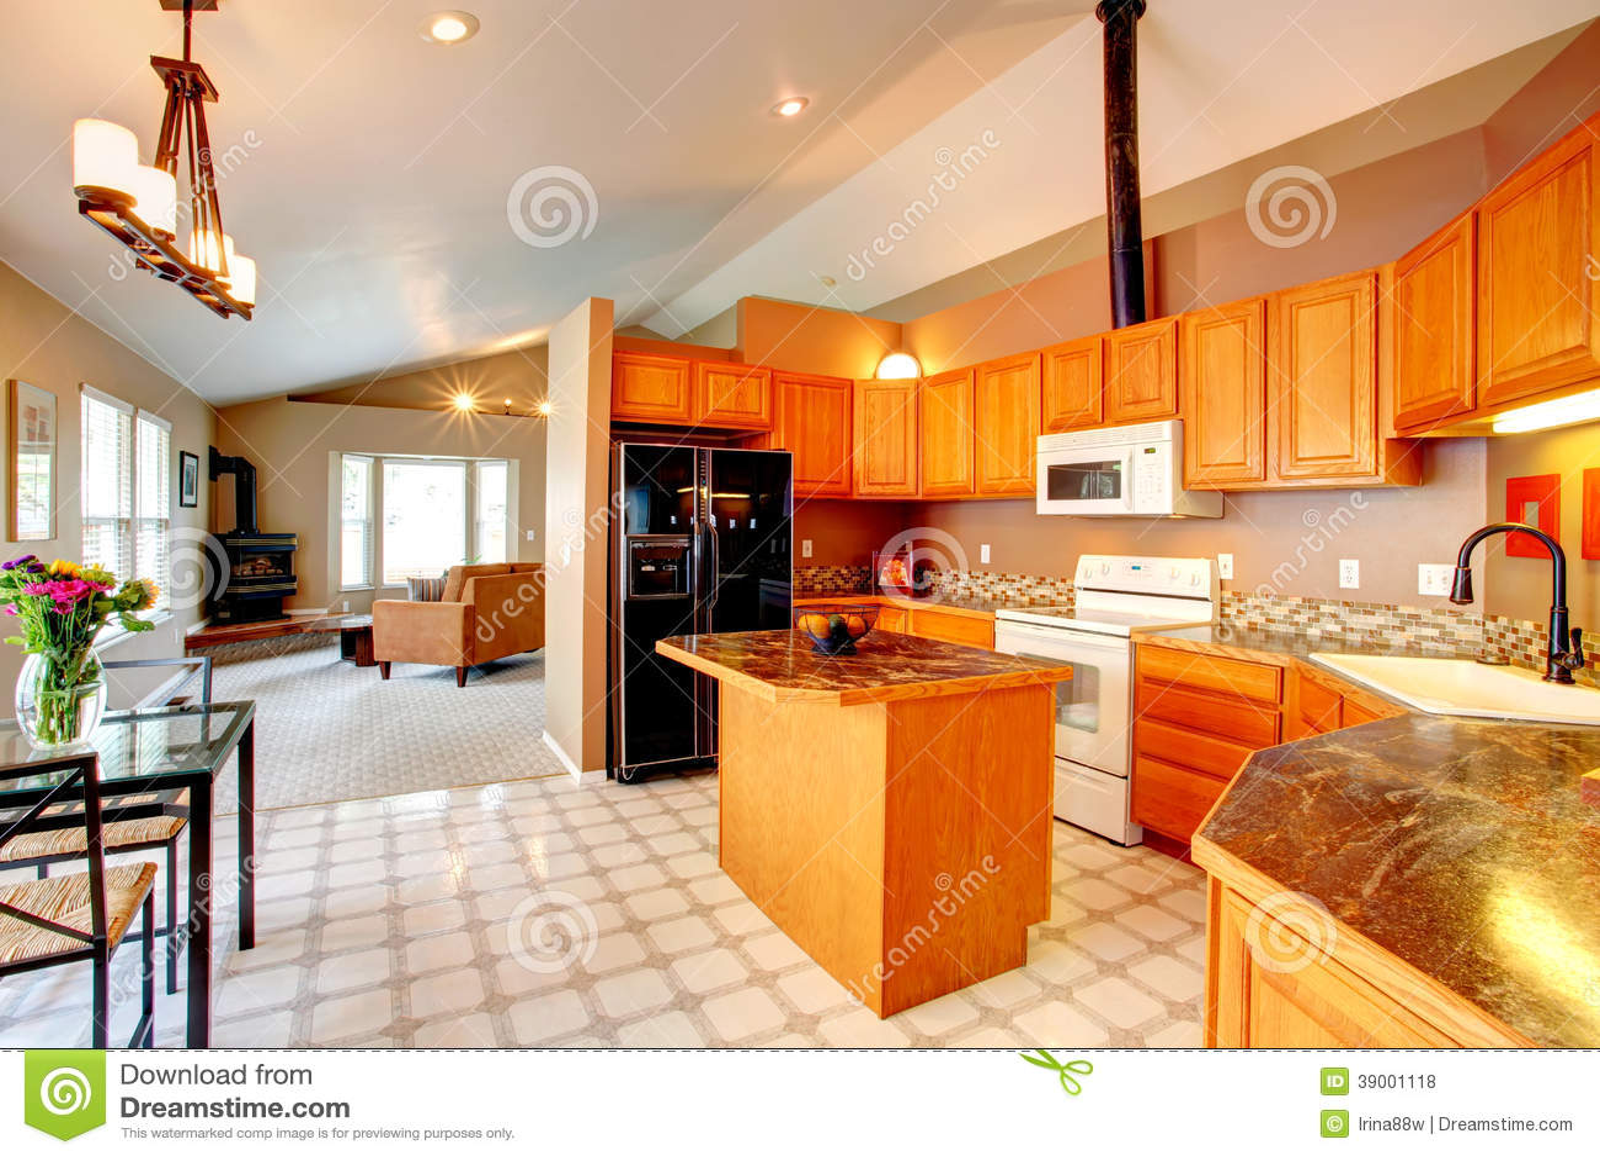 gold kitchen murphy table 金厨房室库存照片 图片包括有内部 实际 更新 最高限额 机柜 大使 有拱顶式顶棚和lenoleum地板的宽敞厨房室 厨房金内阁 海岛和黑冰箱看法